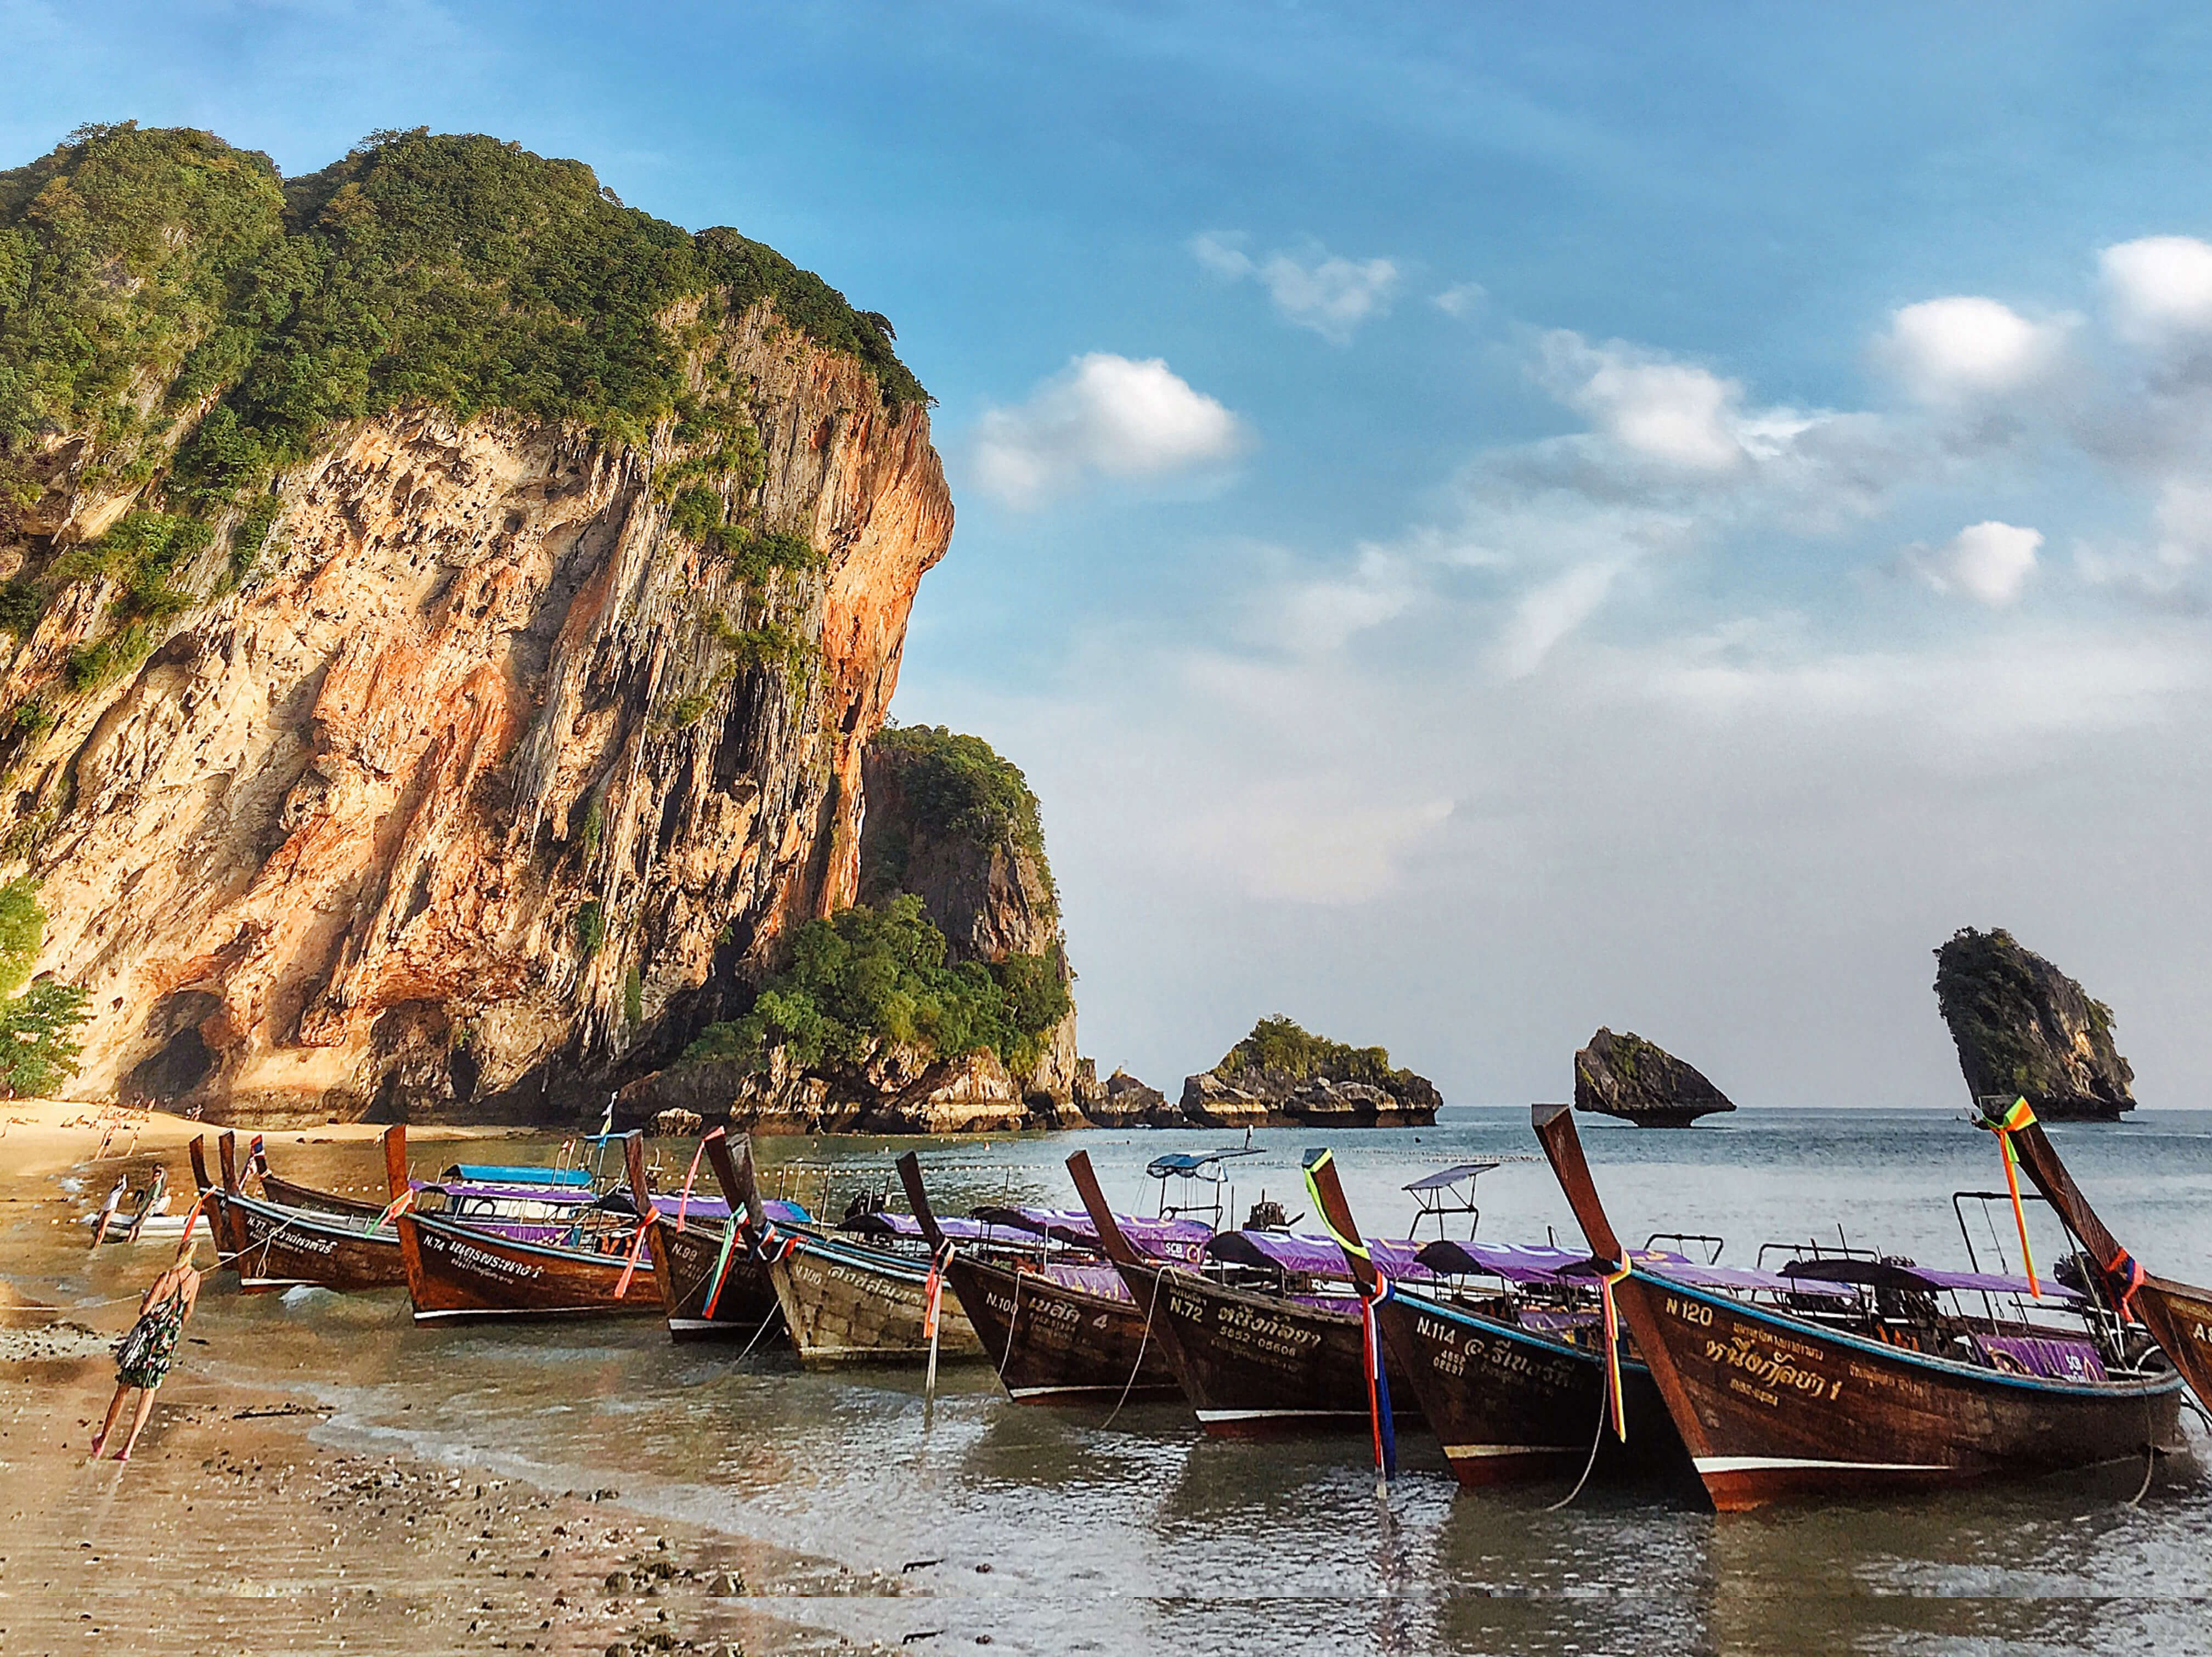 Krabi, road, mountains, nature, sea, boats, горы, природа, лодки, море